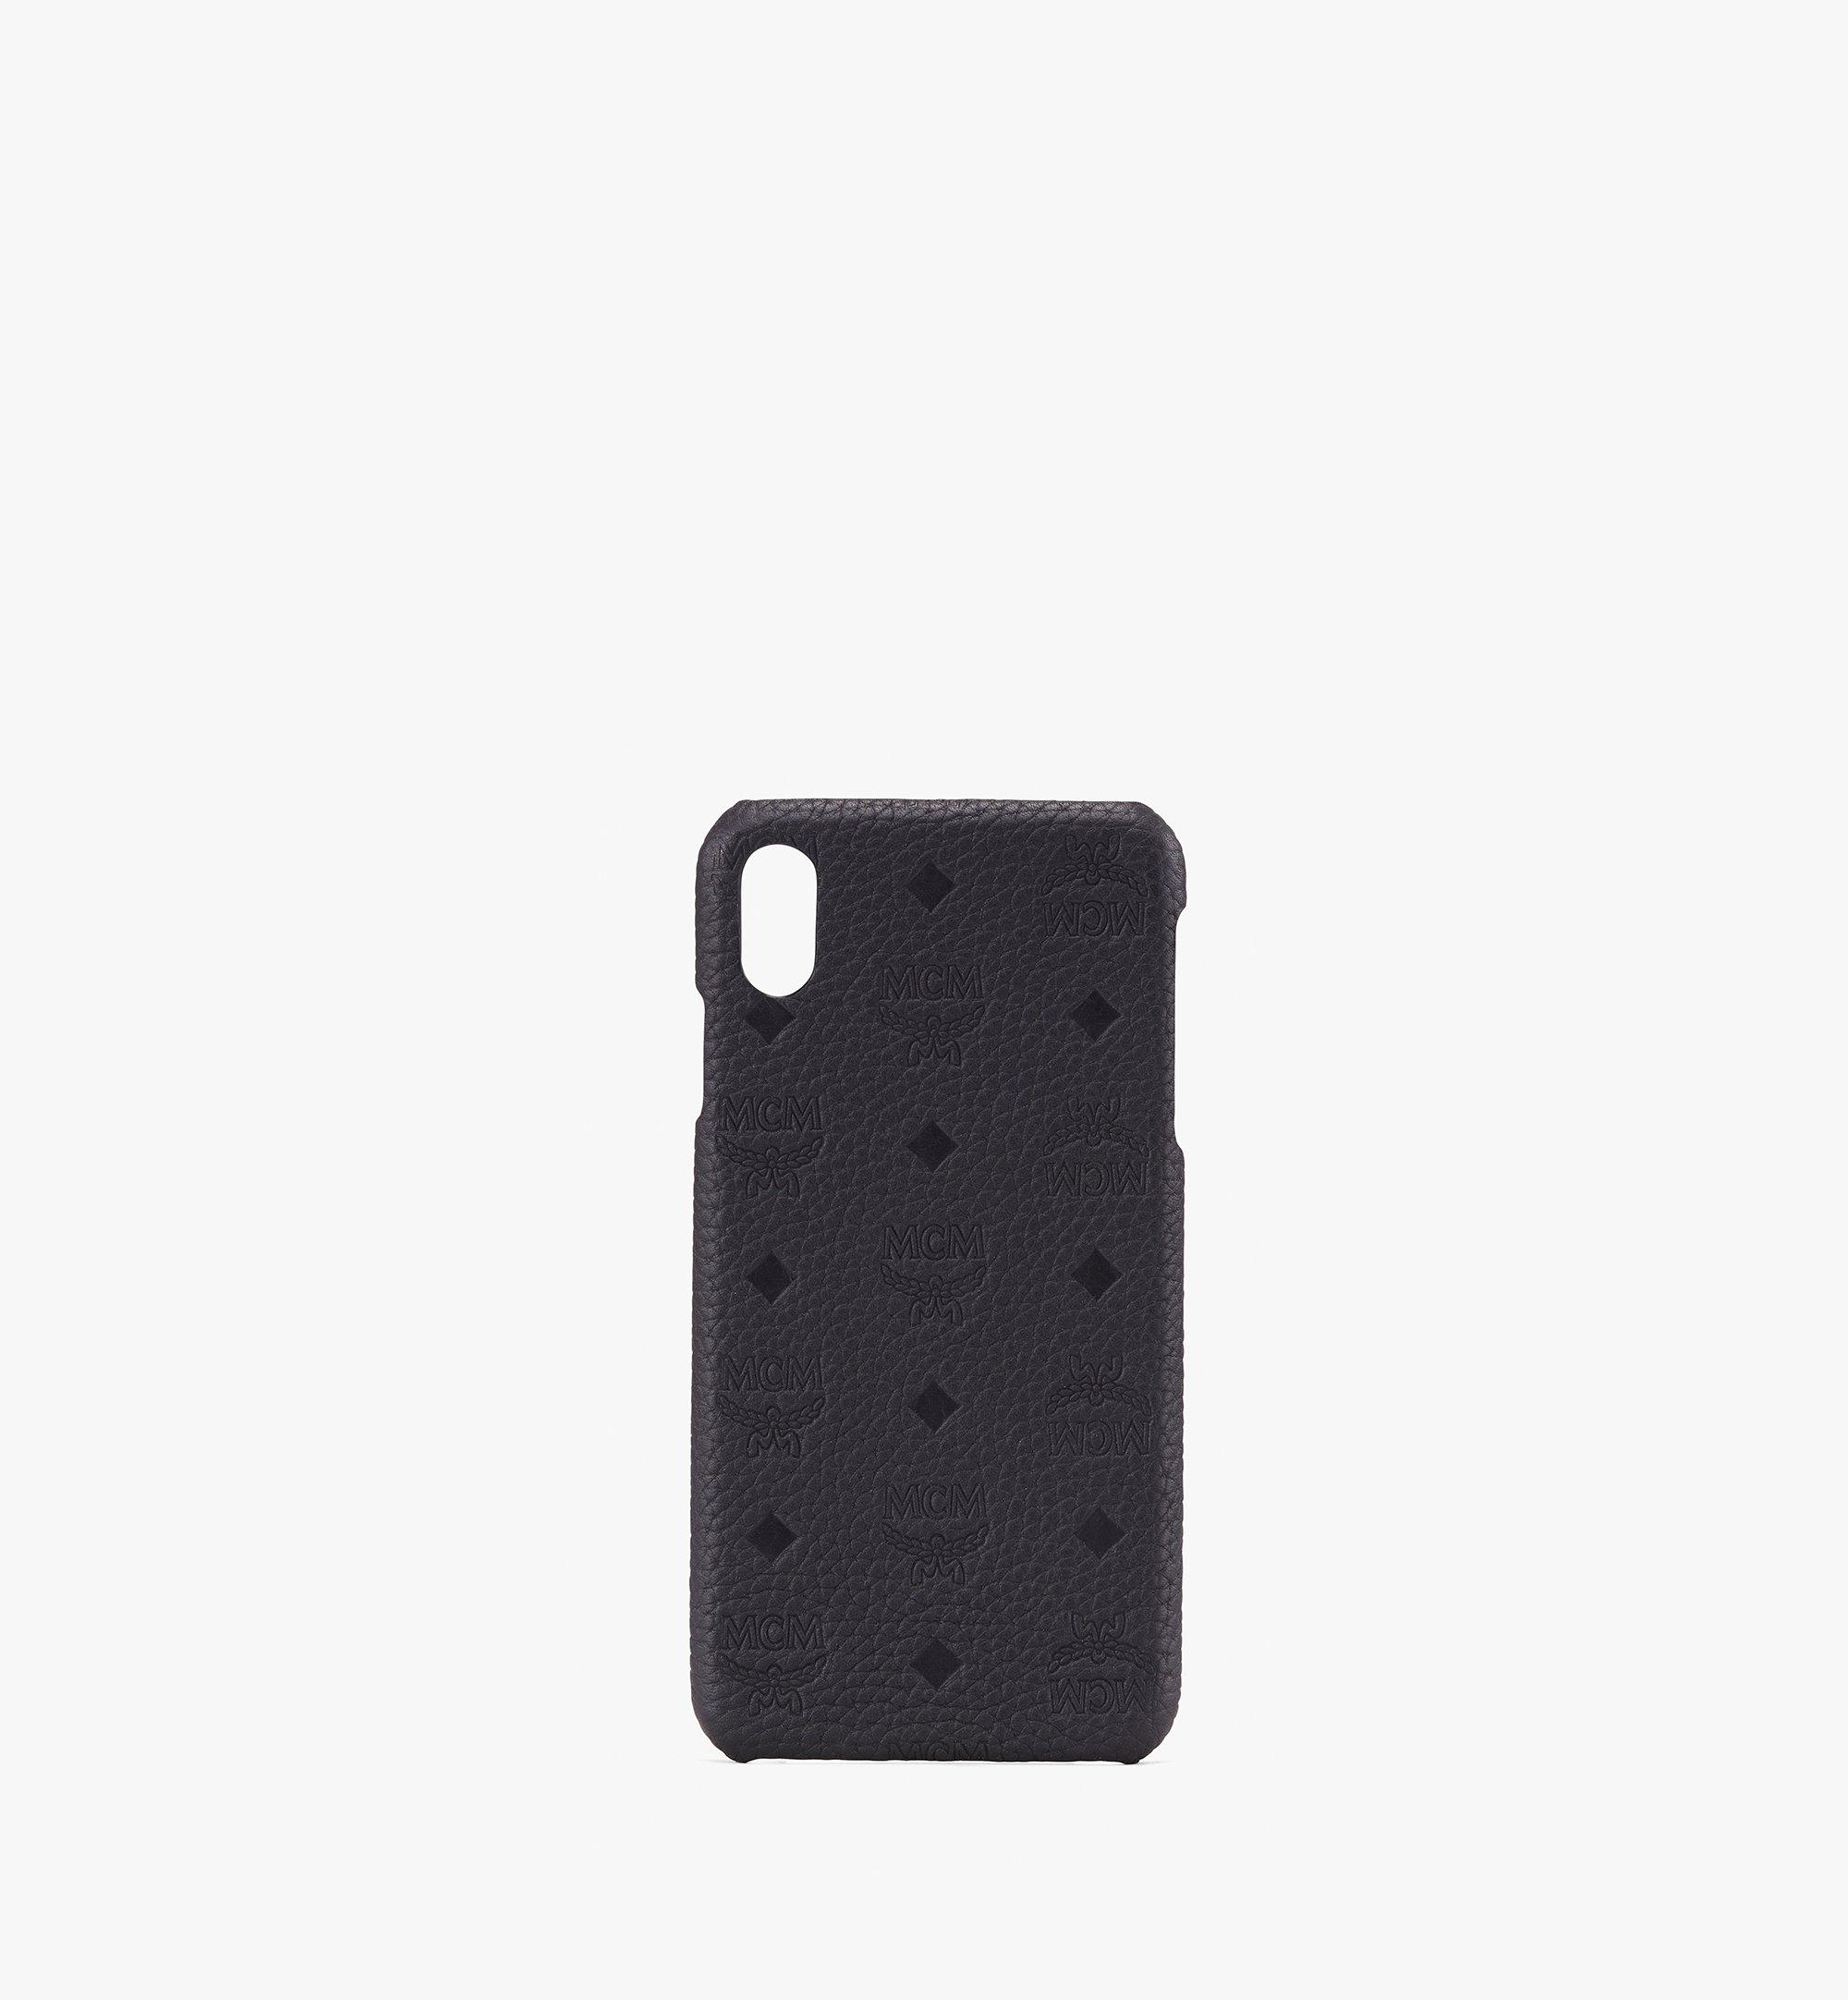 MCM iPhone XS Max ケース ティヴィタット レザー Black MZE9ABT30BK001 Alternate View 1